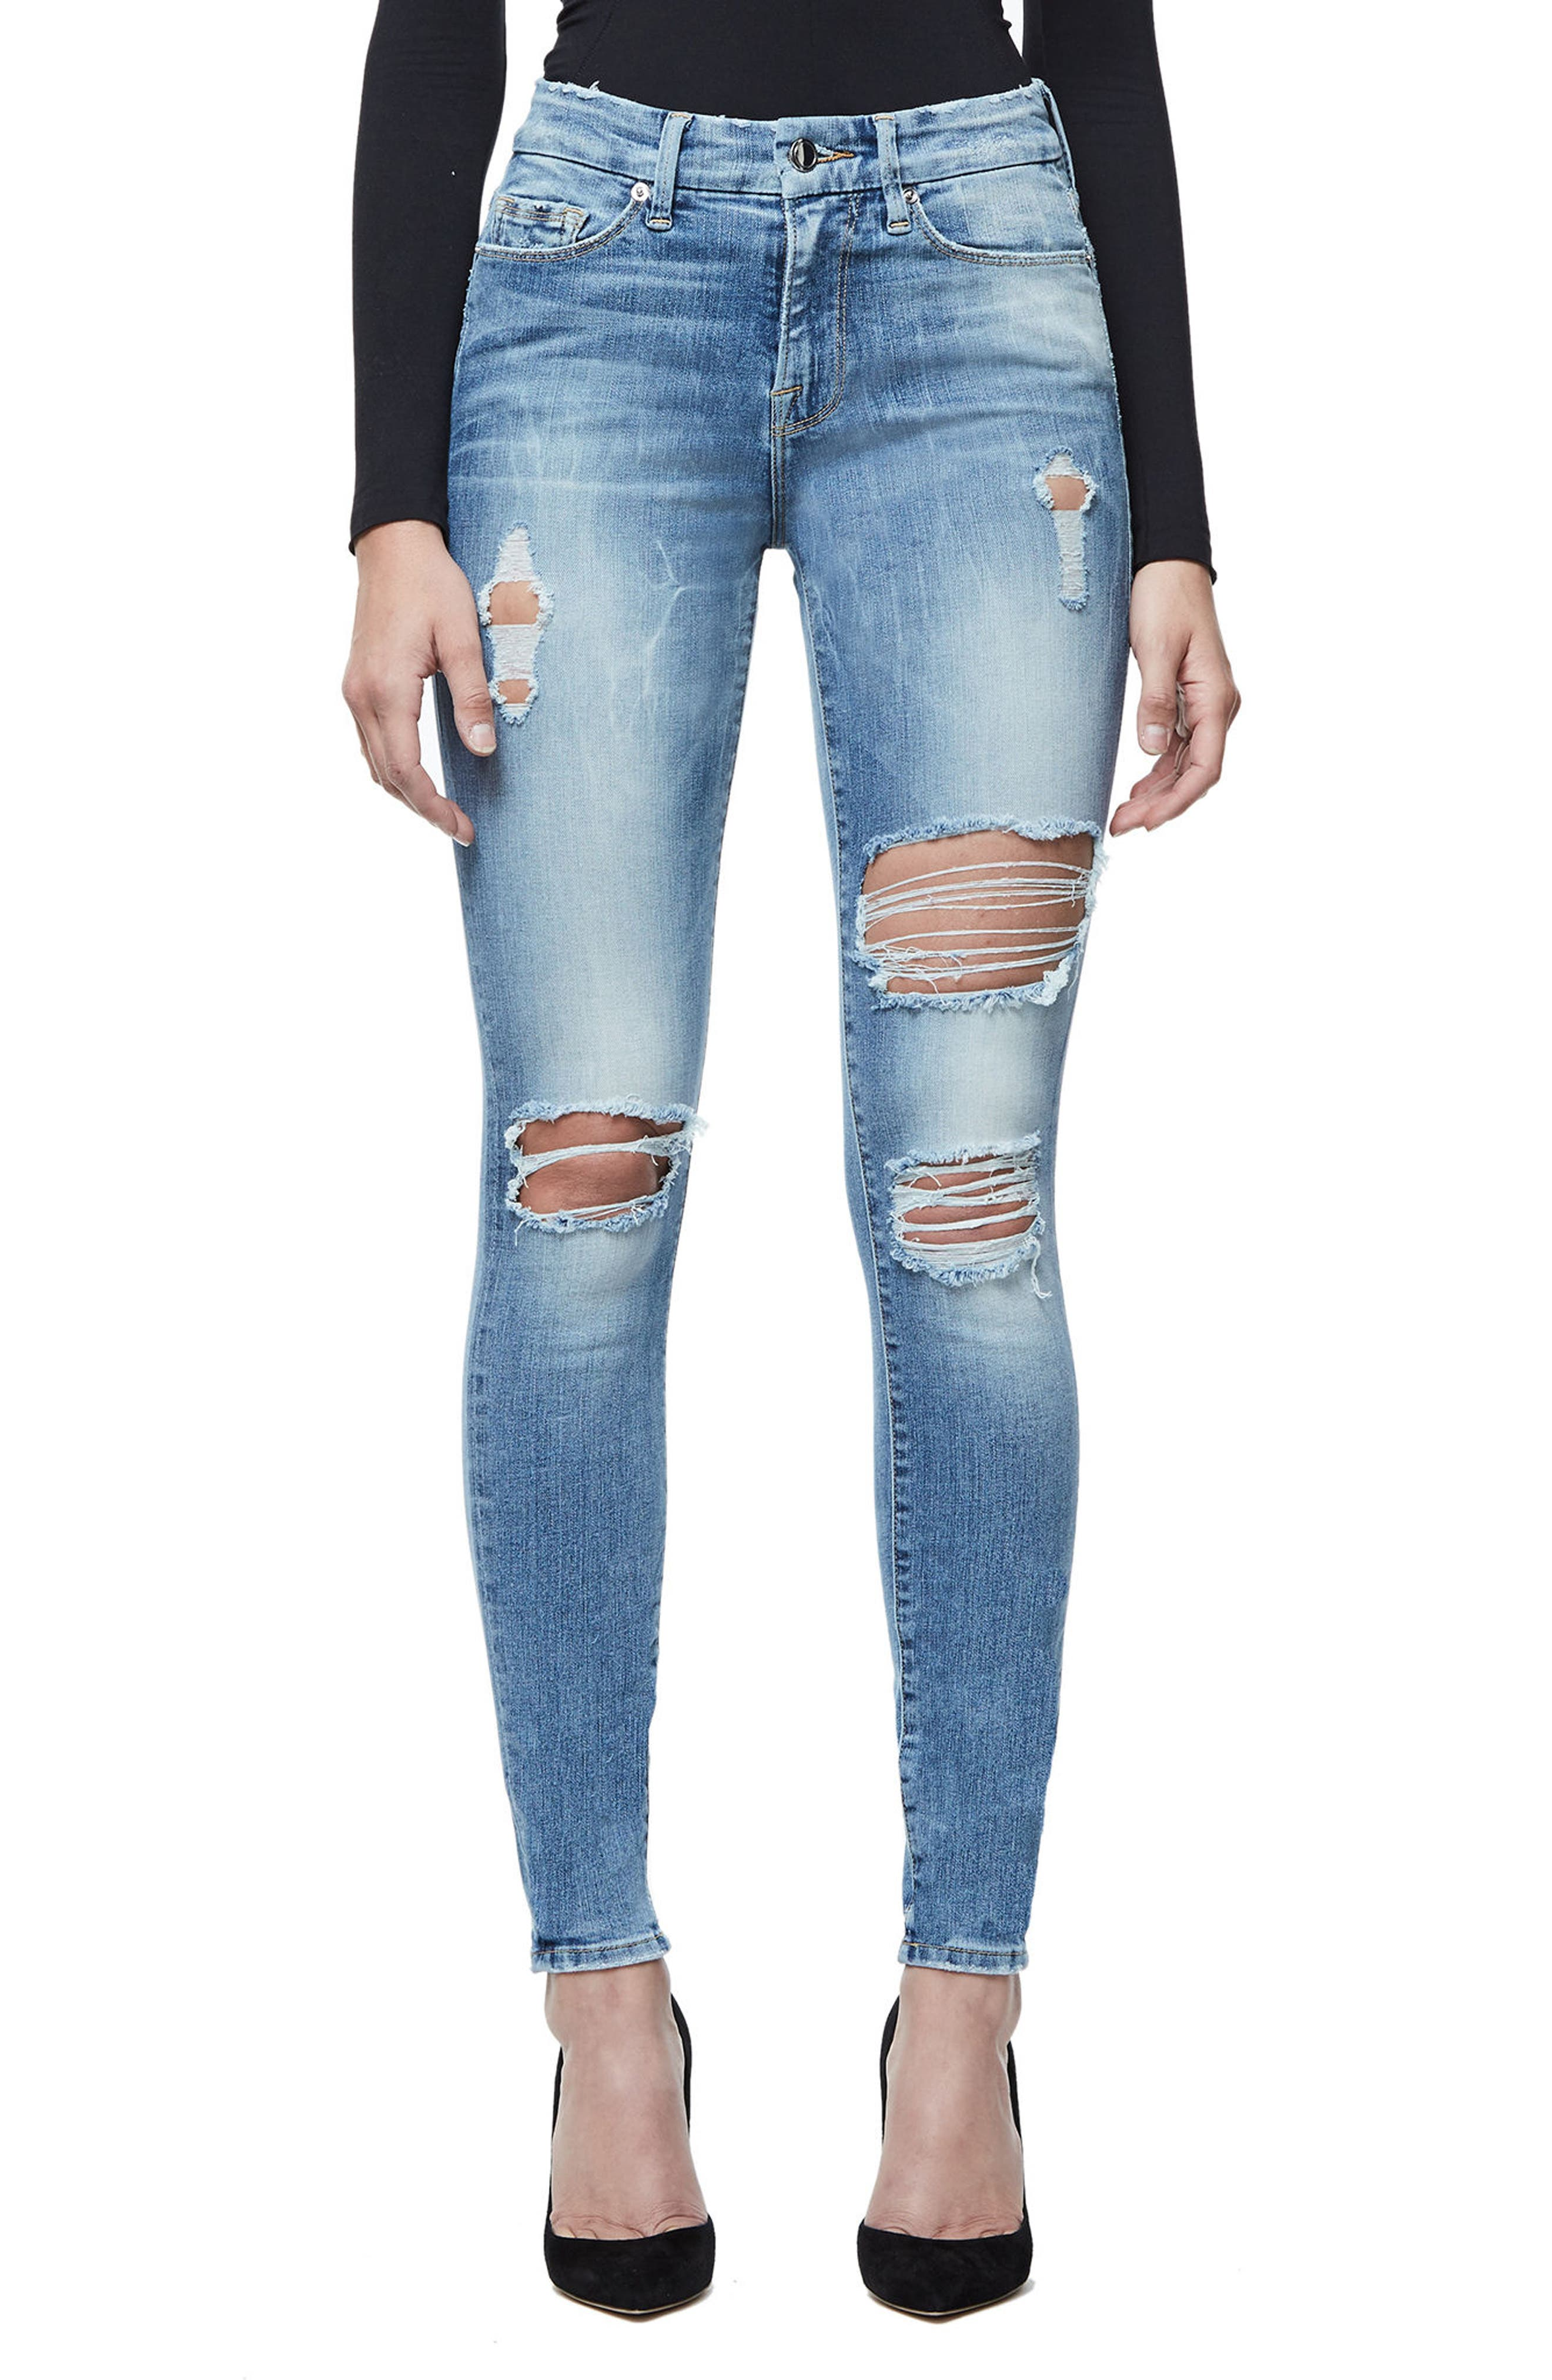 Alternate Image 1 Selected - Good American Good Legs Ripped Skinny Jeans (Blue 068)